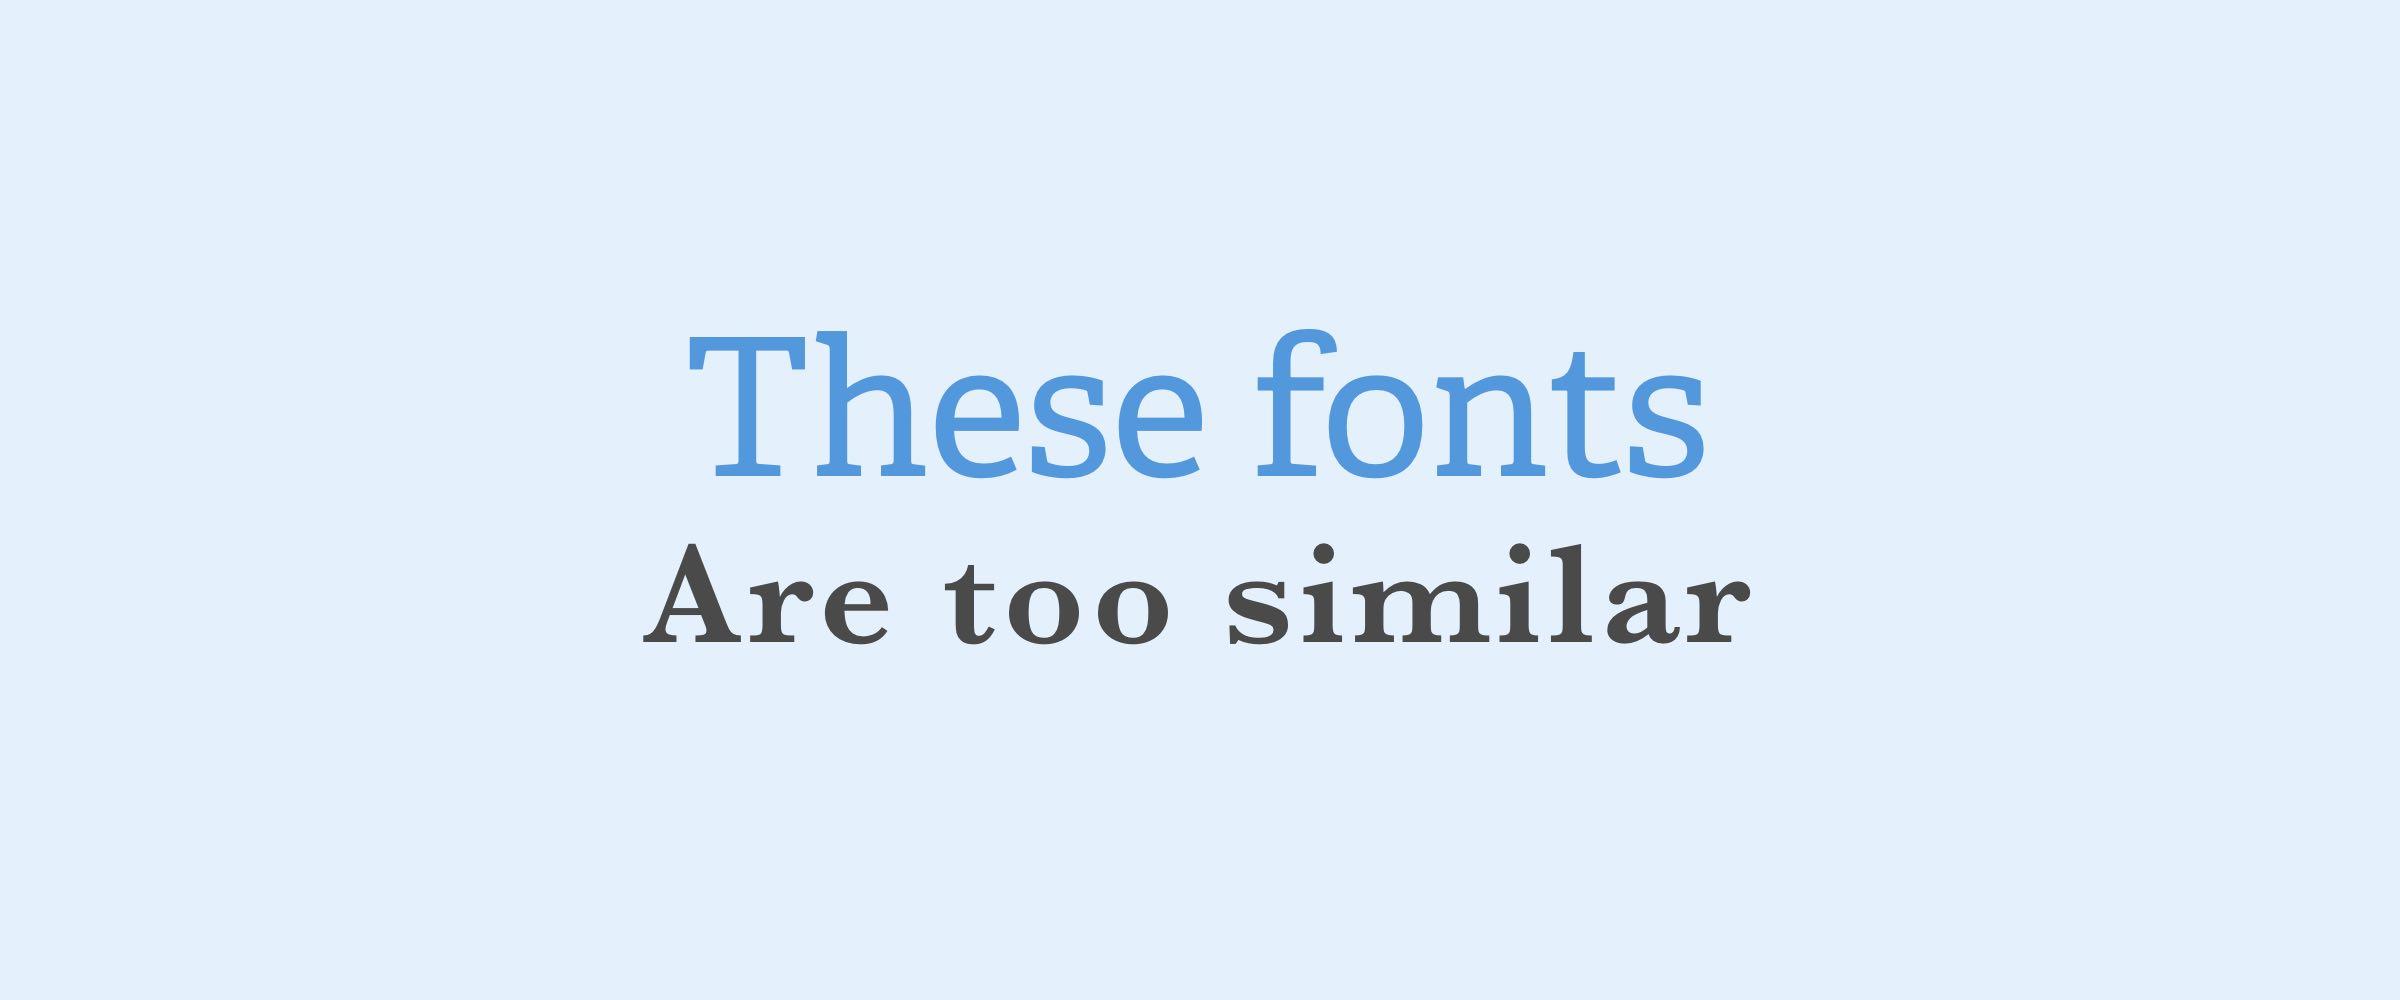 Create Contrast Between Your Fonts